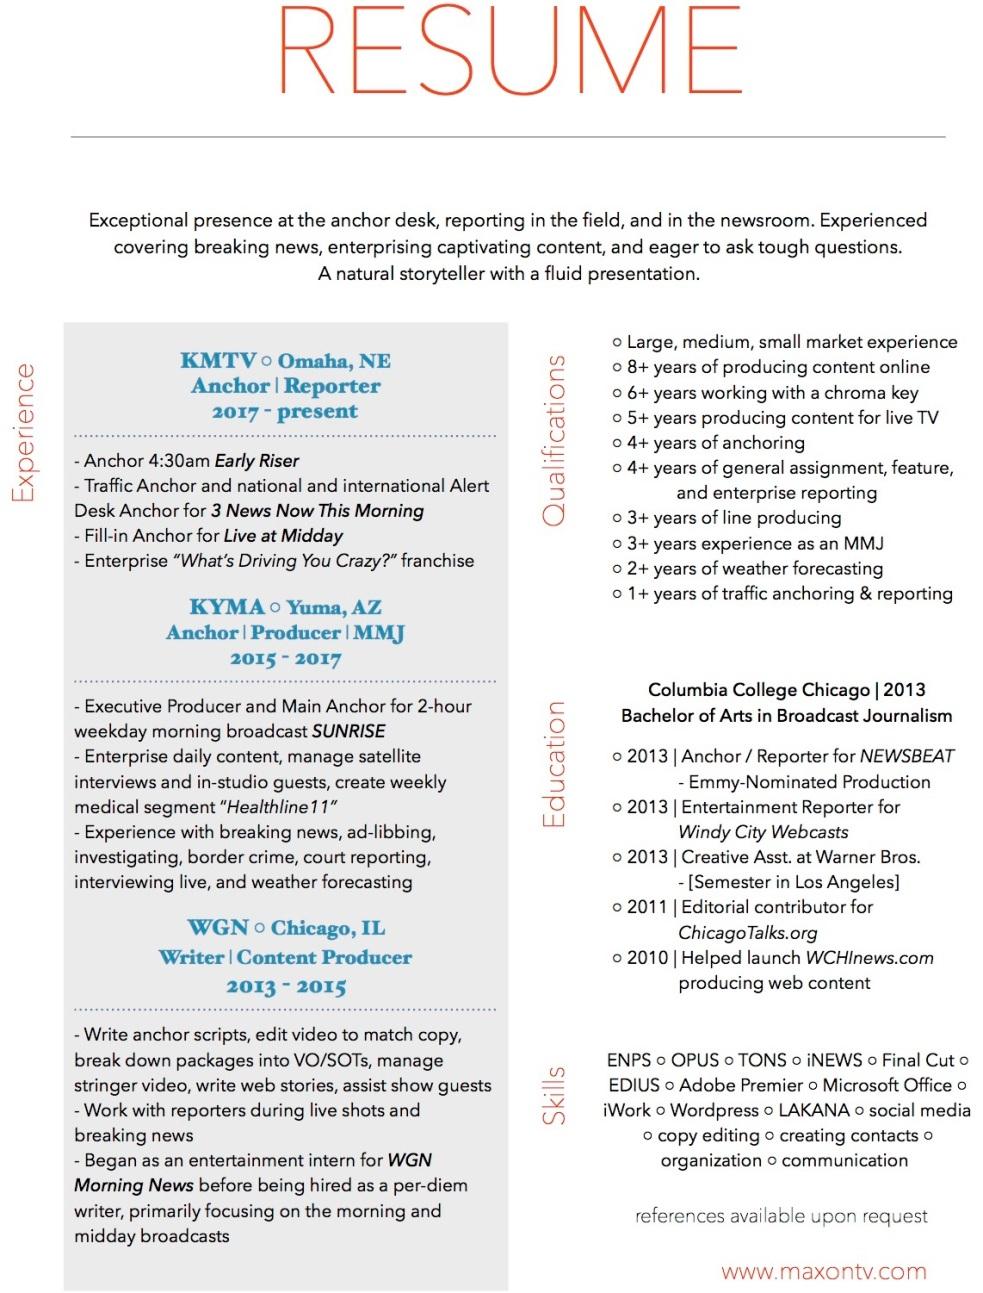 resume generic.jpg